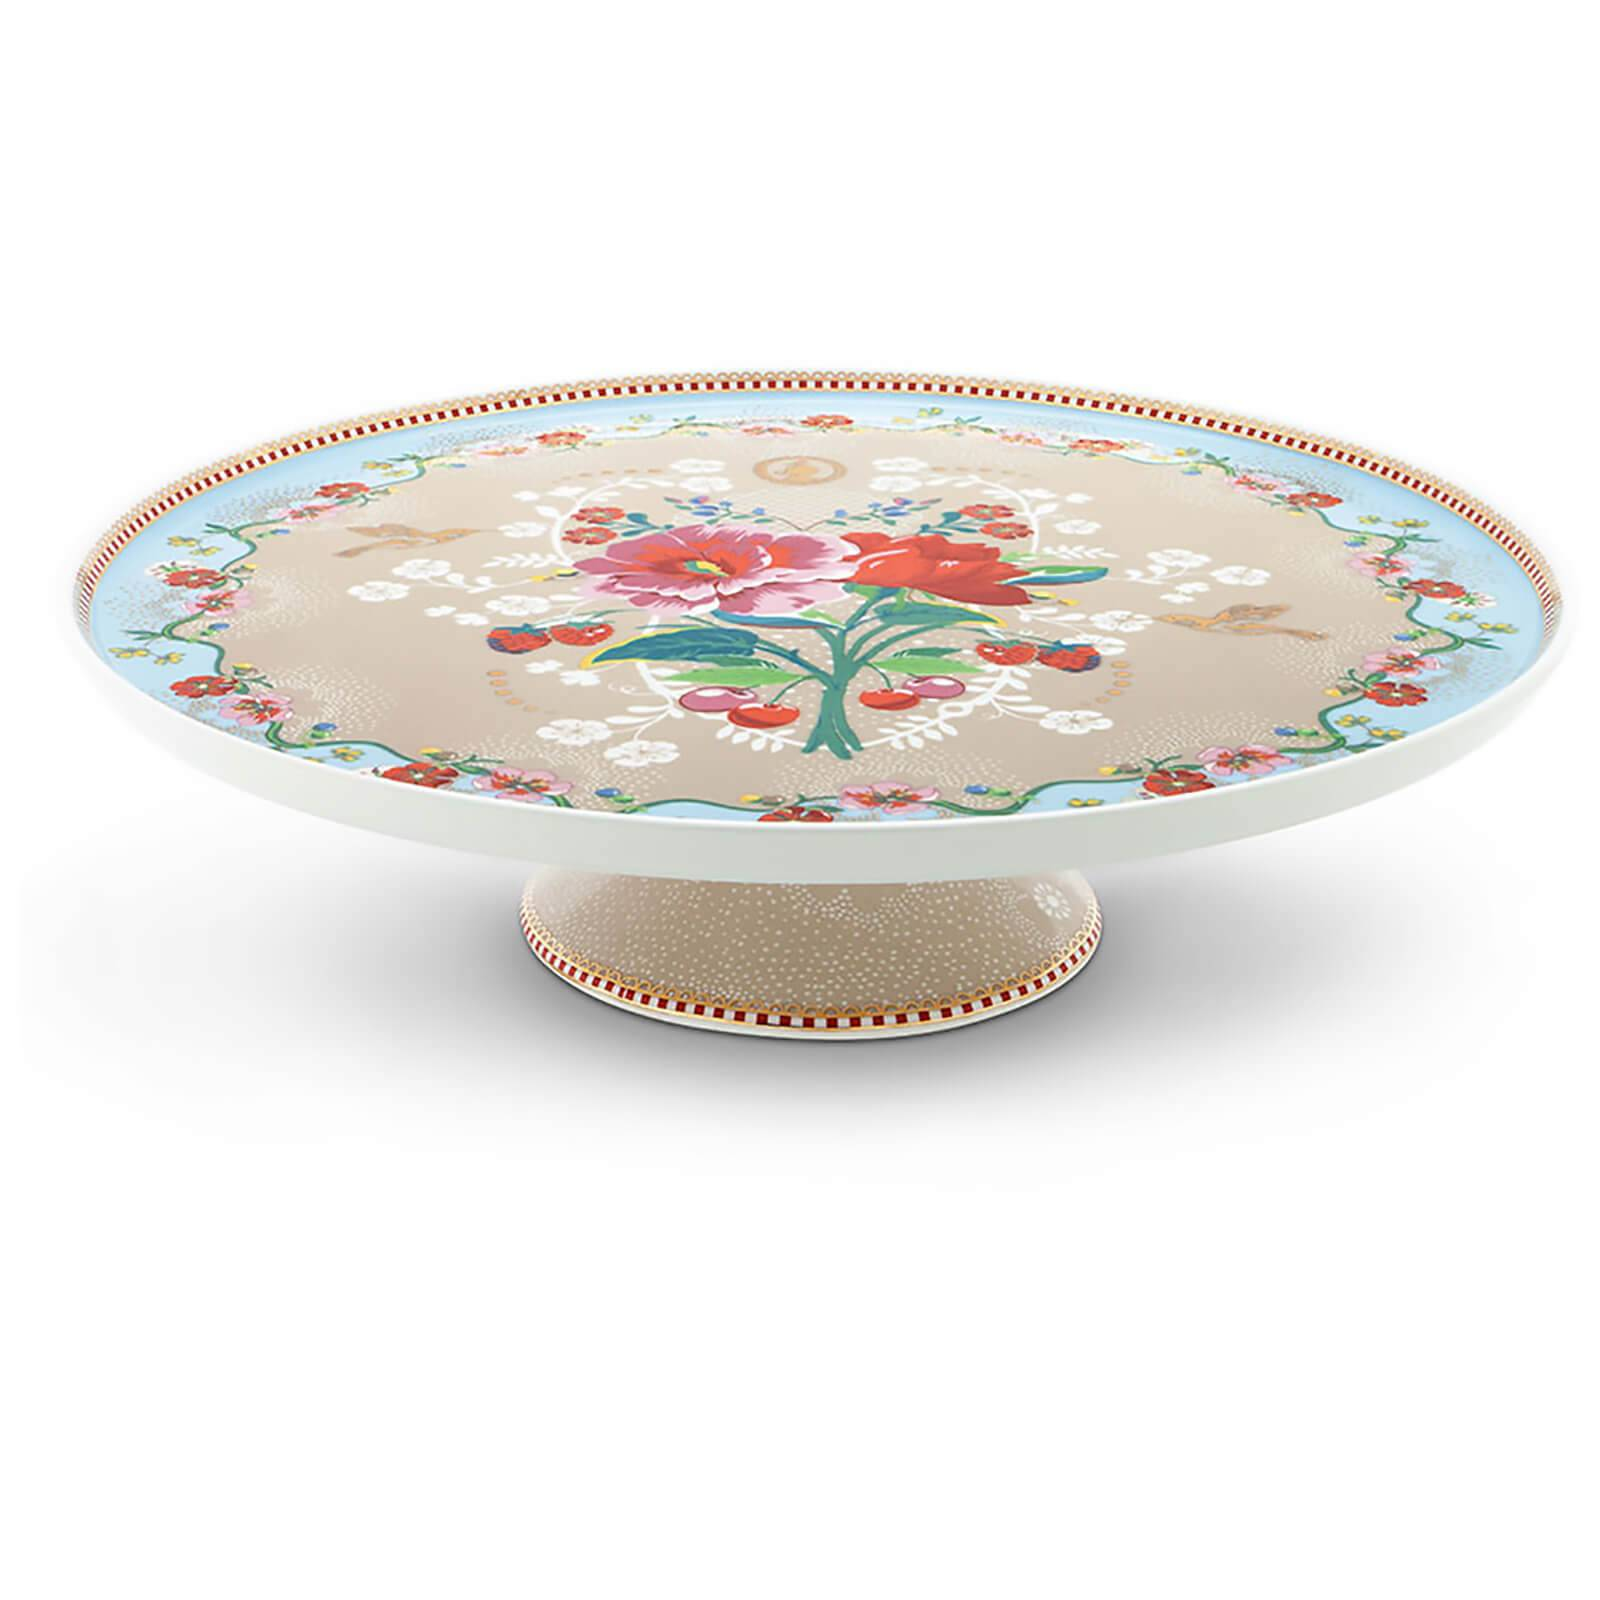 Pip Studio Rose Cake Tray - Khaki